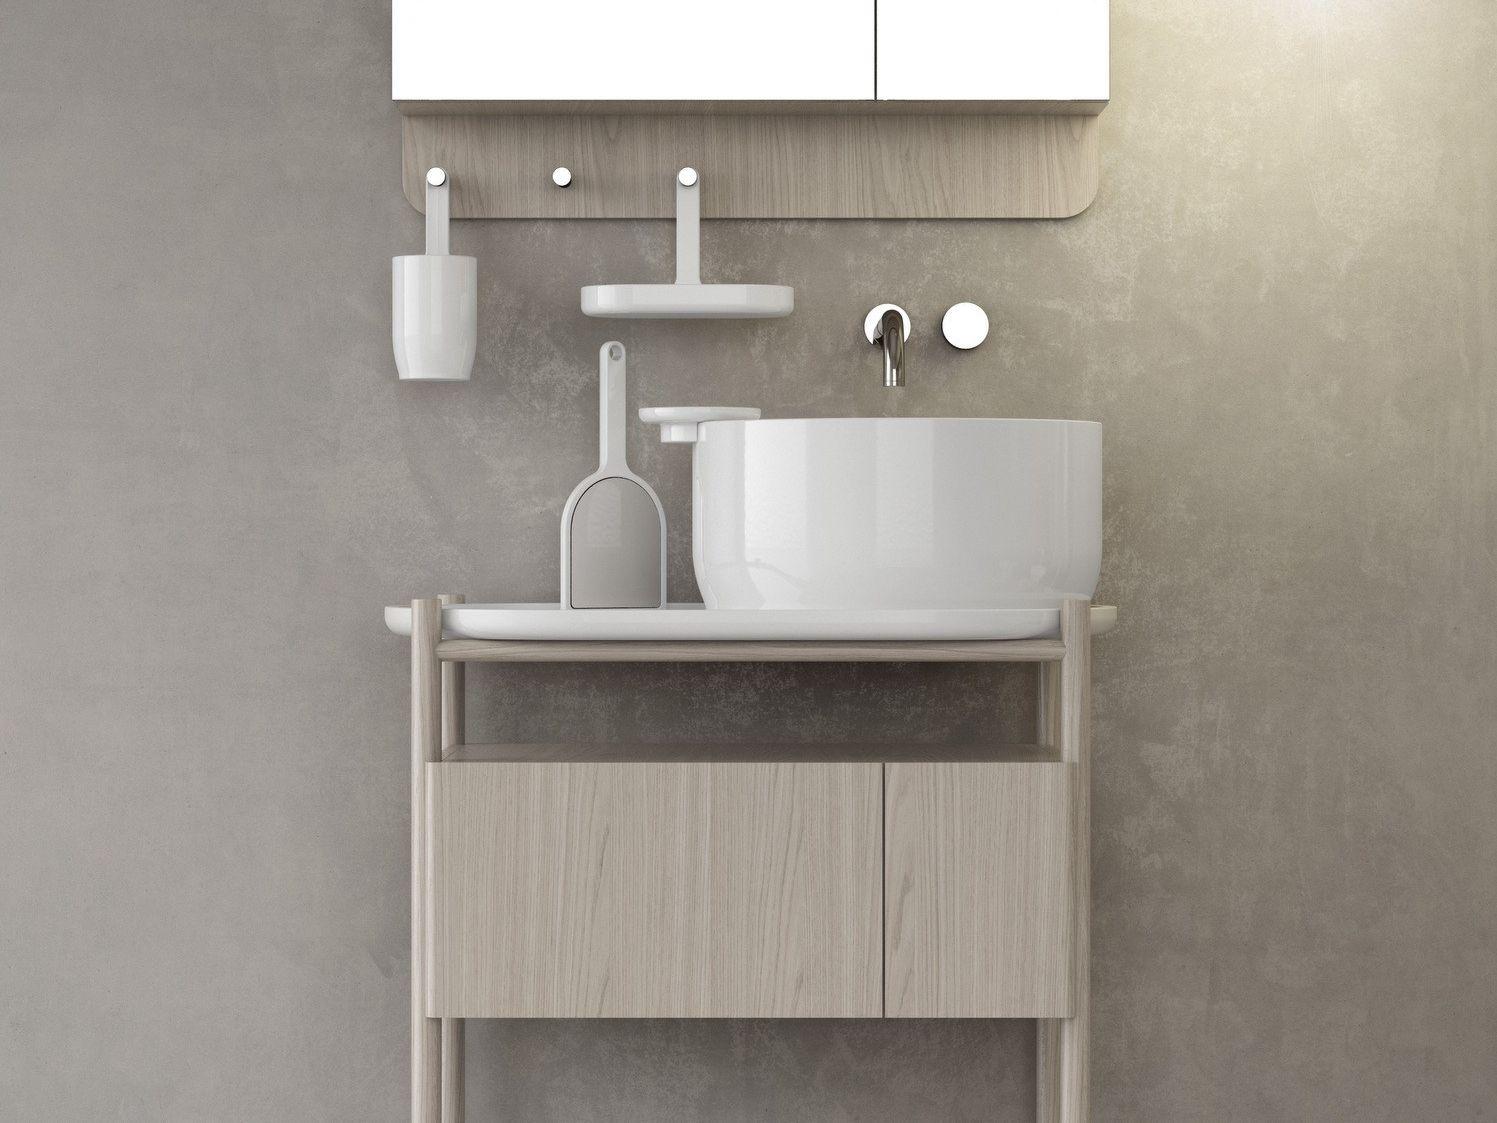 Ukiyo e lavabo sobre encimera by olympia ceramica for Lavabo sobre